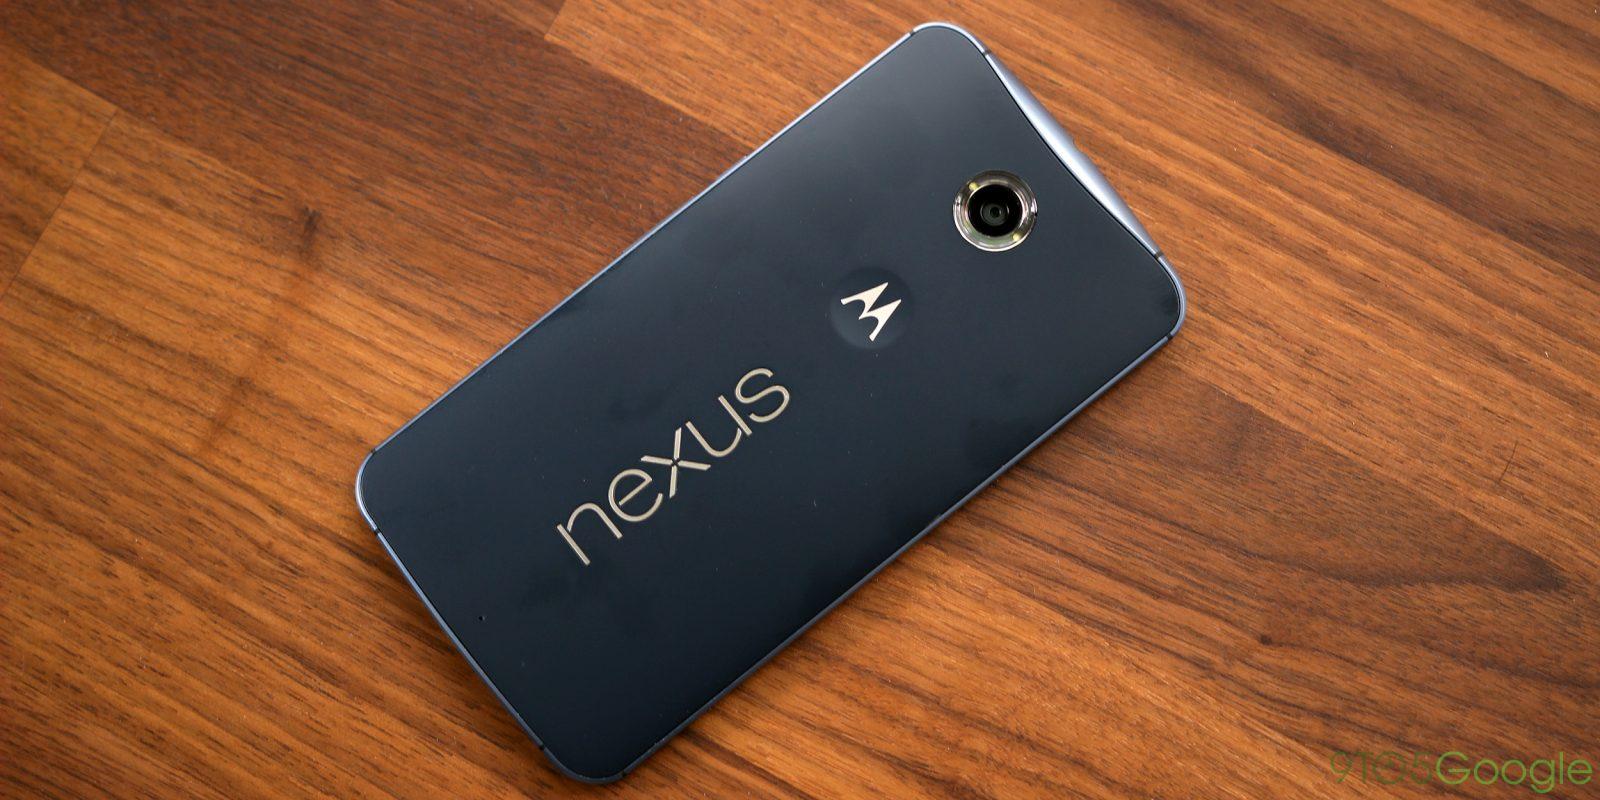 Nexus 6 - 9to5Google